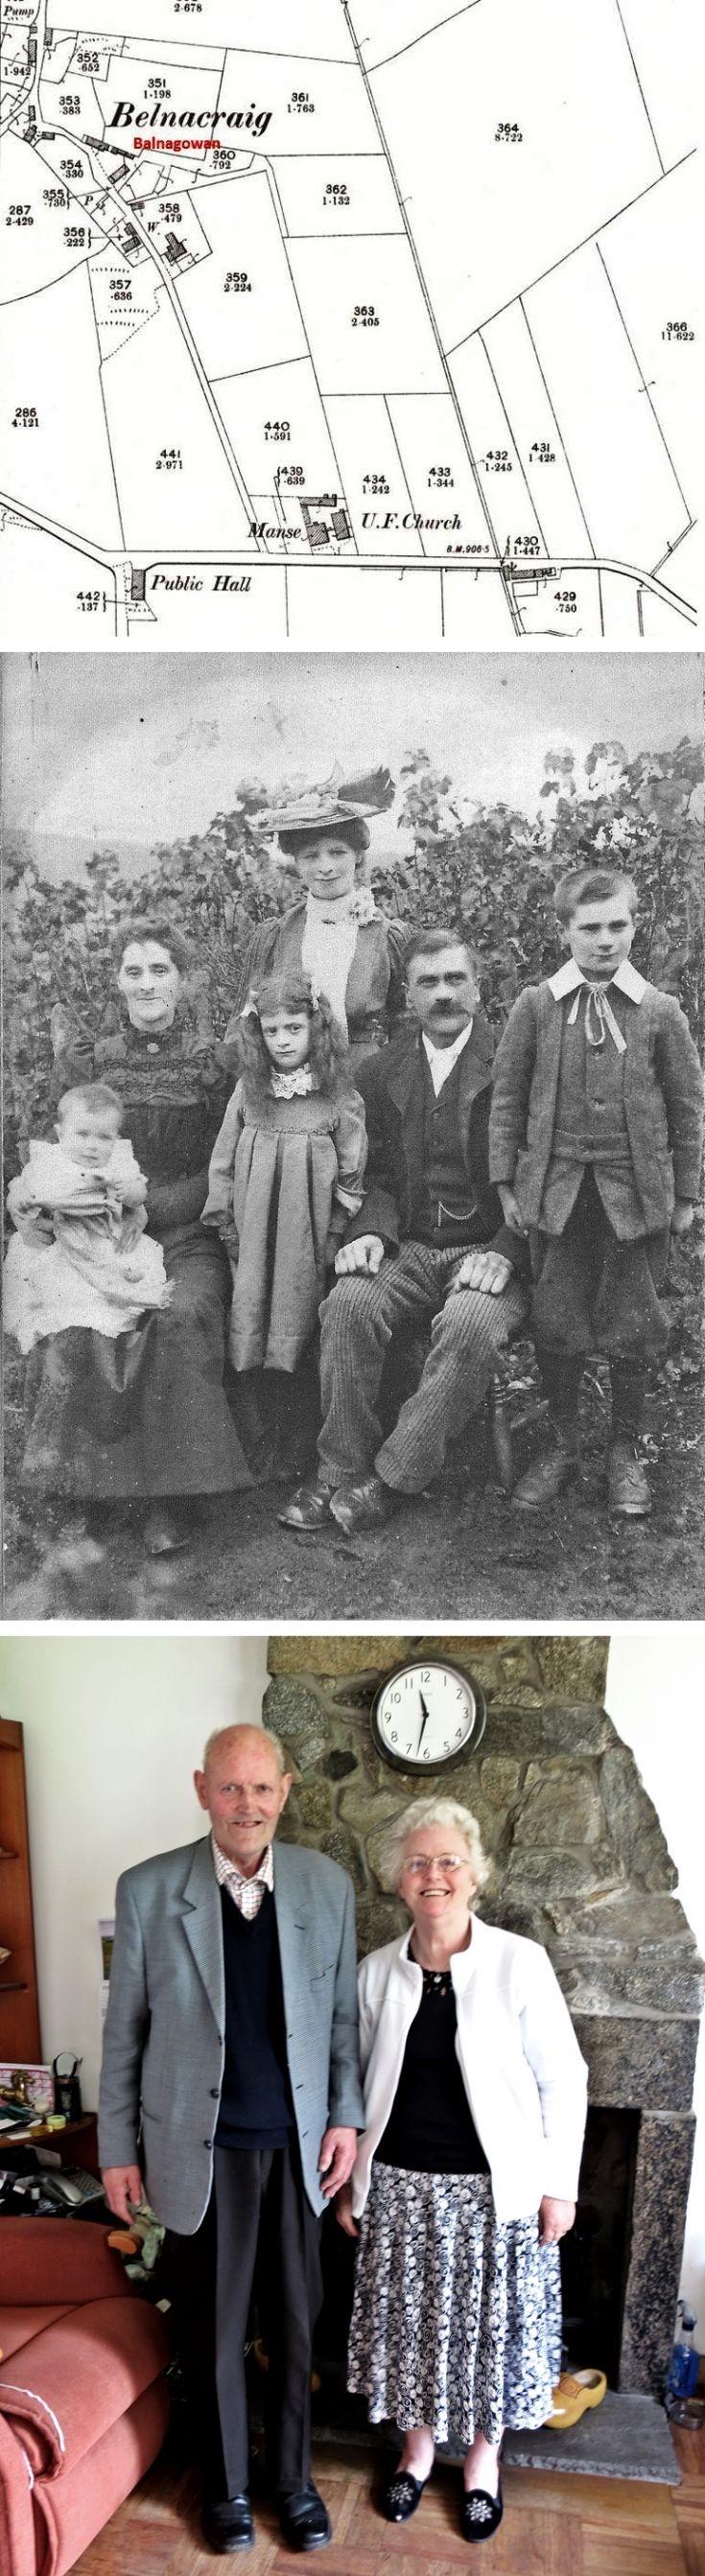 2 The Shand Family at Balnagowan Croft